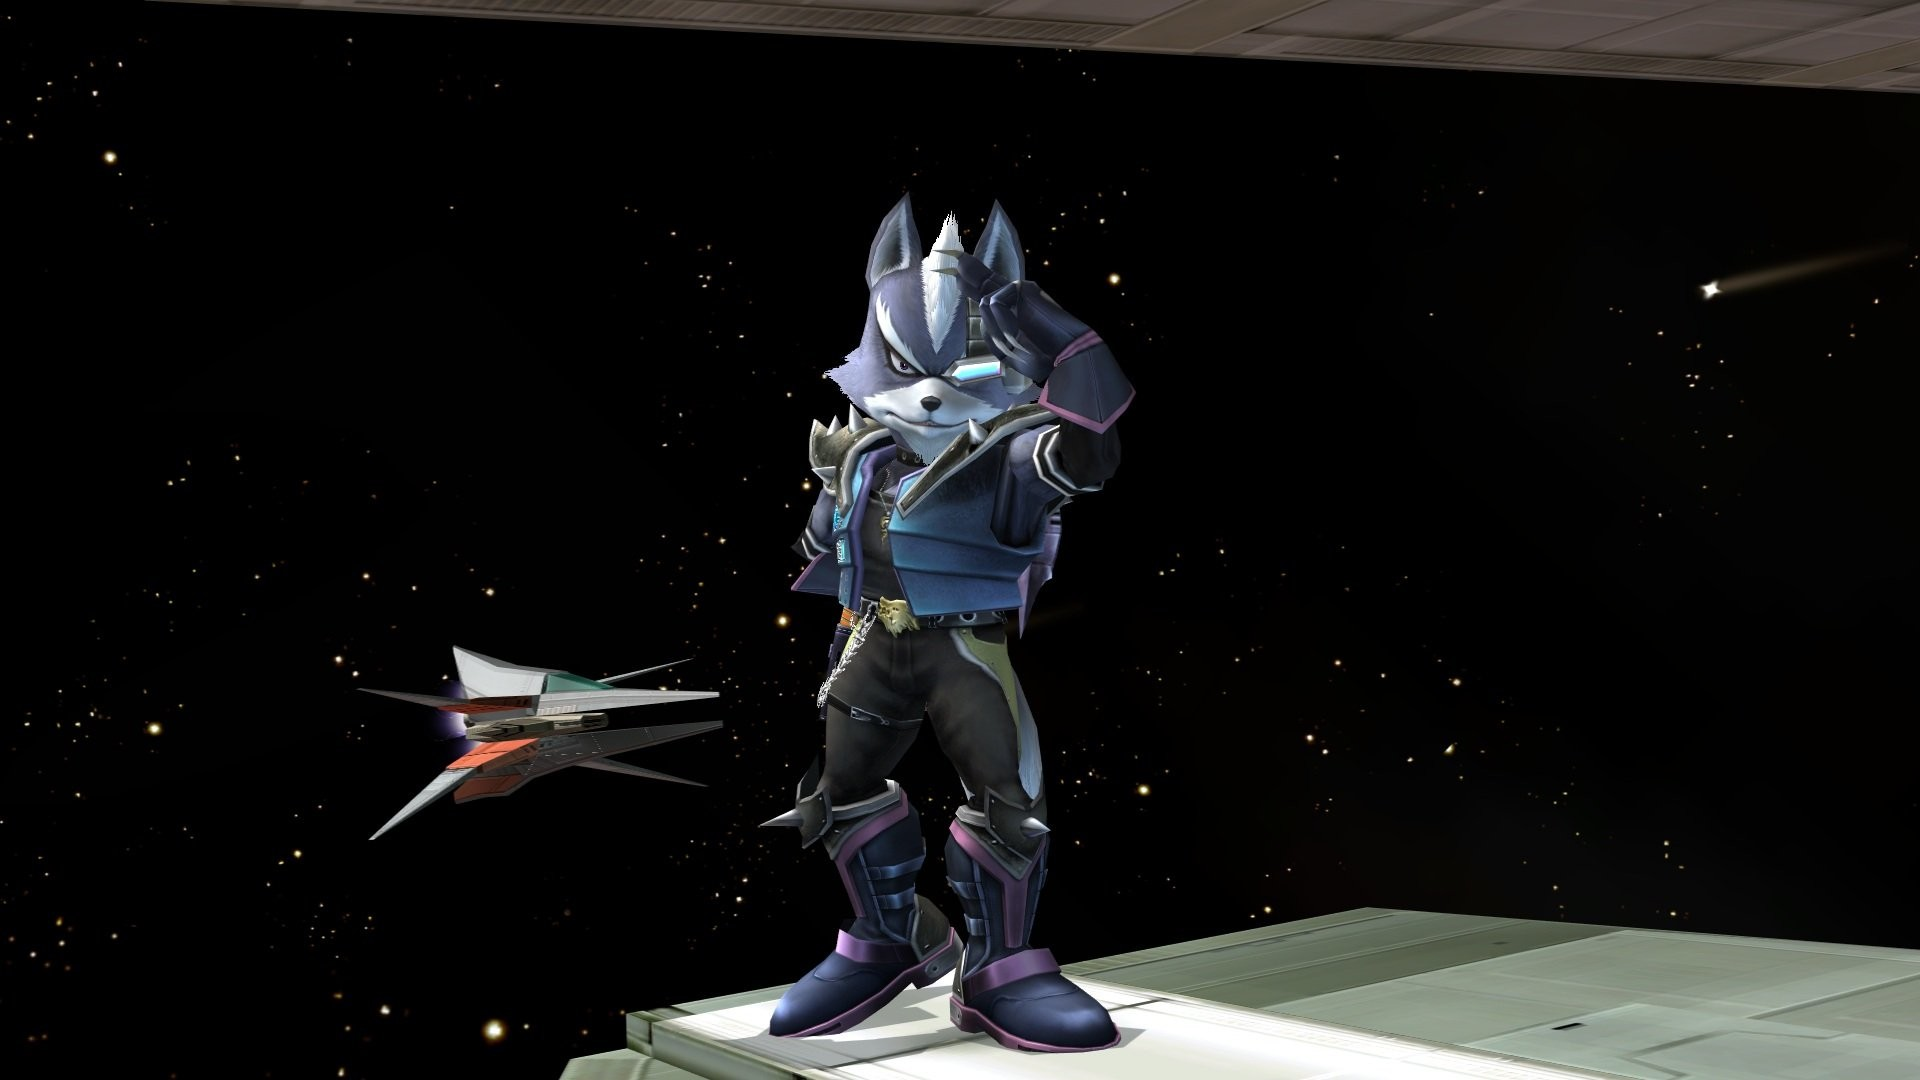 STARFOX shooter family nintendo sci-fi star fox (33) wallpaper      380439   WallpaperUP